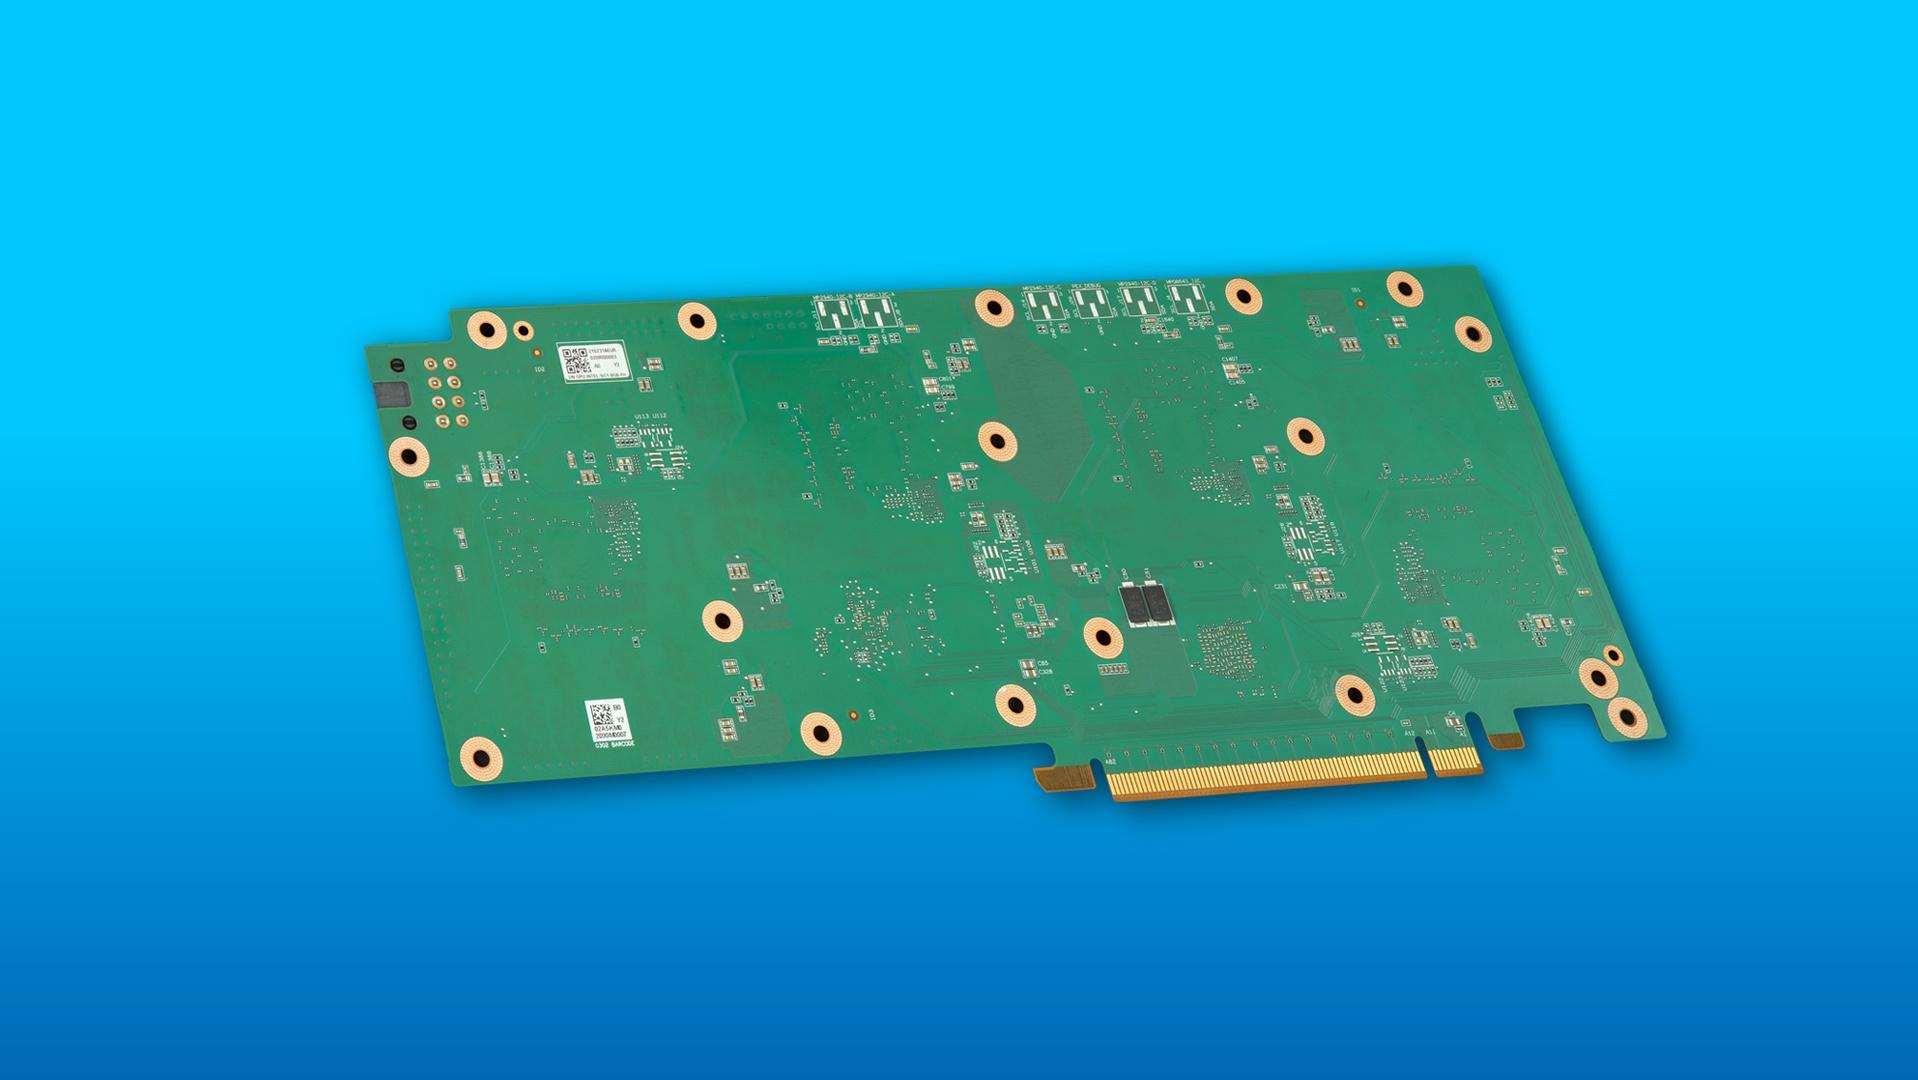 Intel-H3C-XG310-PCIe-card-5